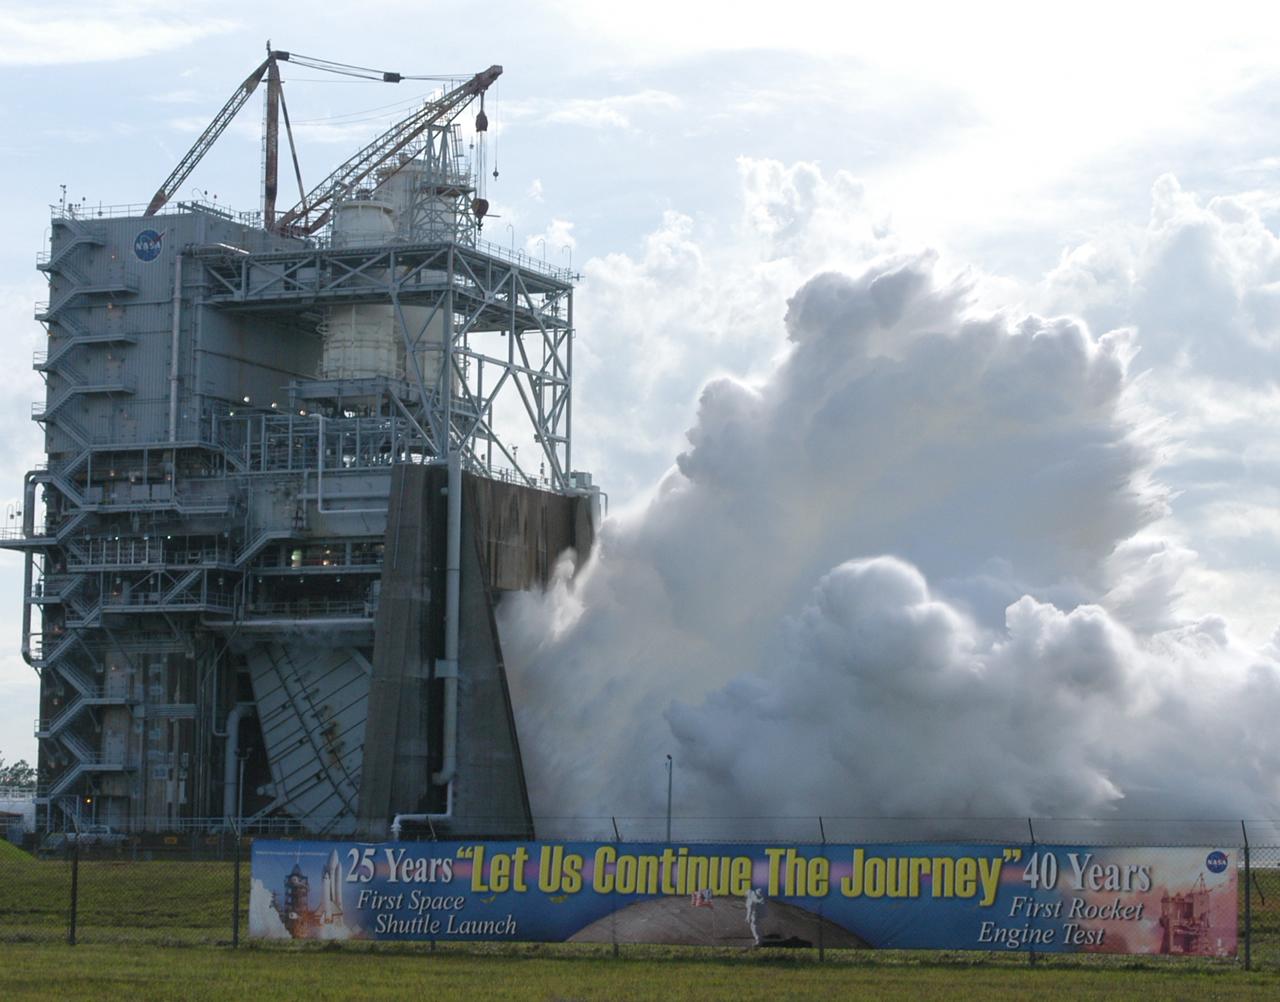 NASA - NASA STENNIS SPACE CENTER MARKS 40TH ANNIVERSARY OF ...